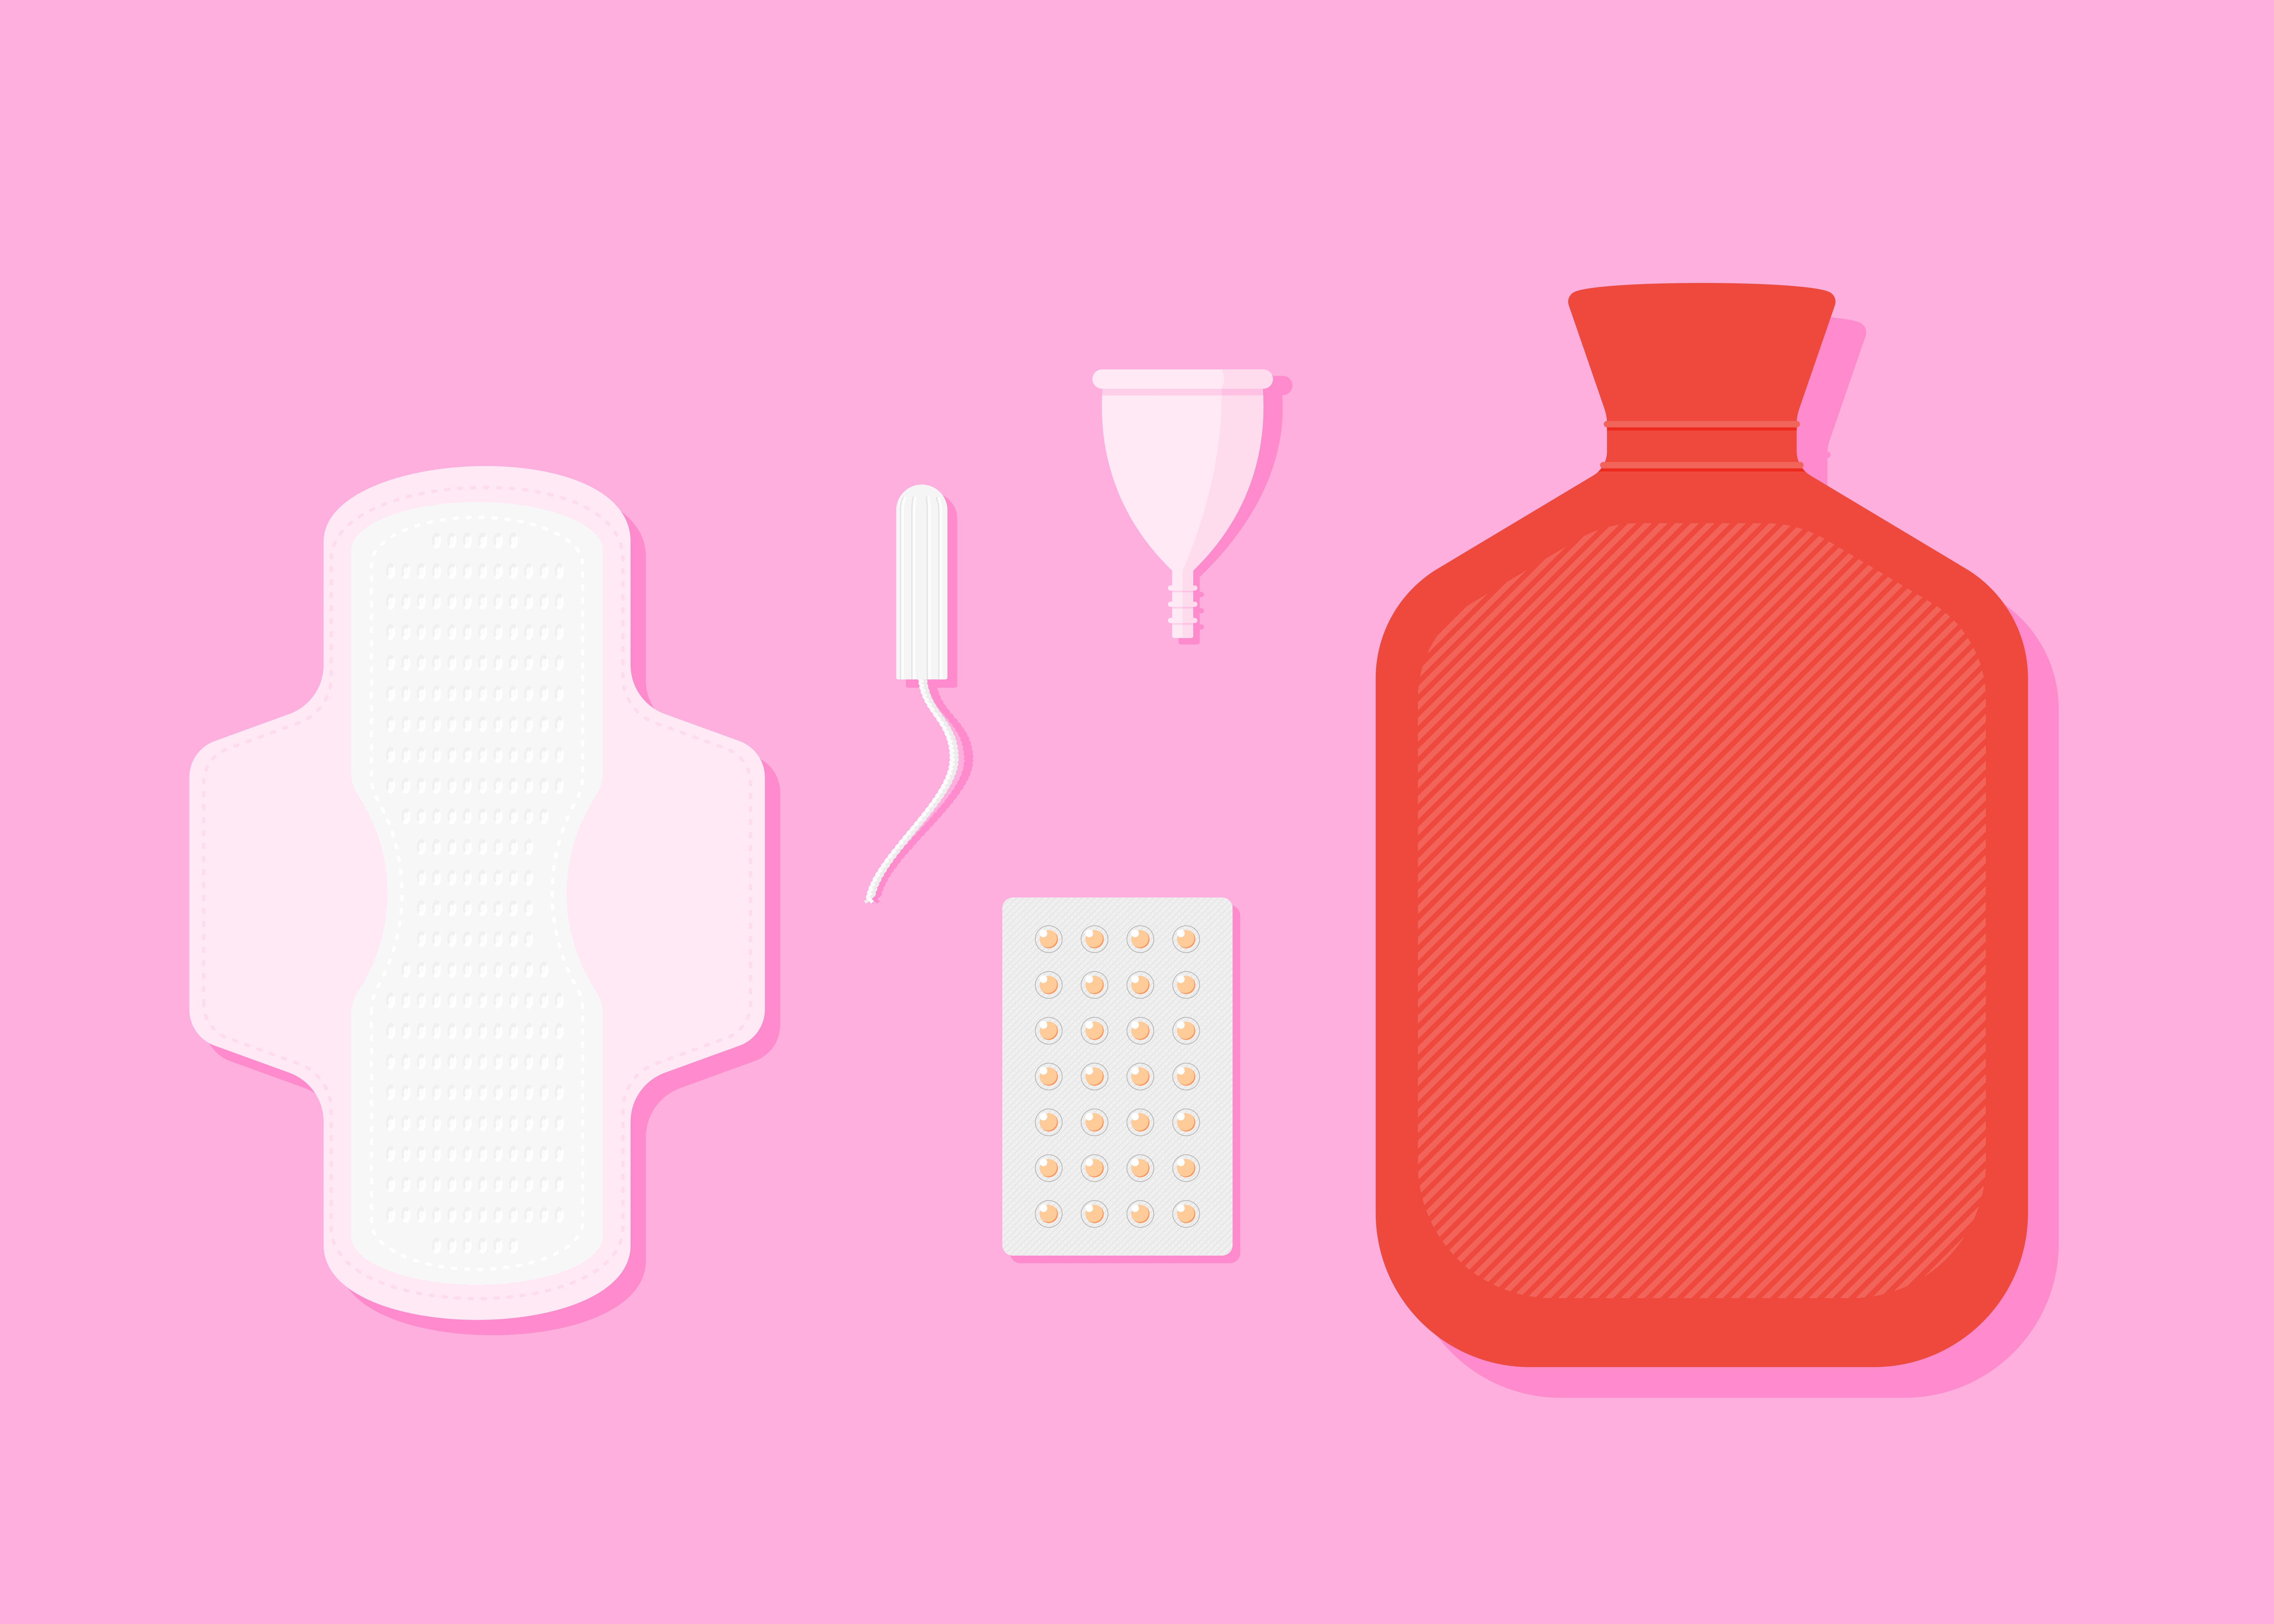 Period pain relief feminine menstruation hygiene set illustration